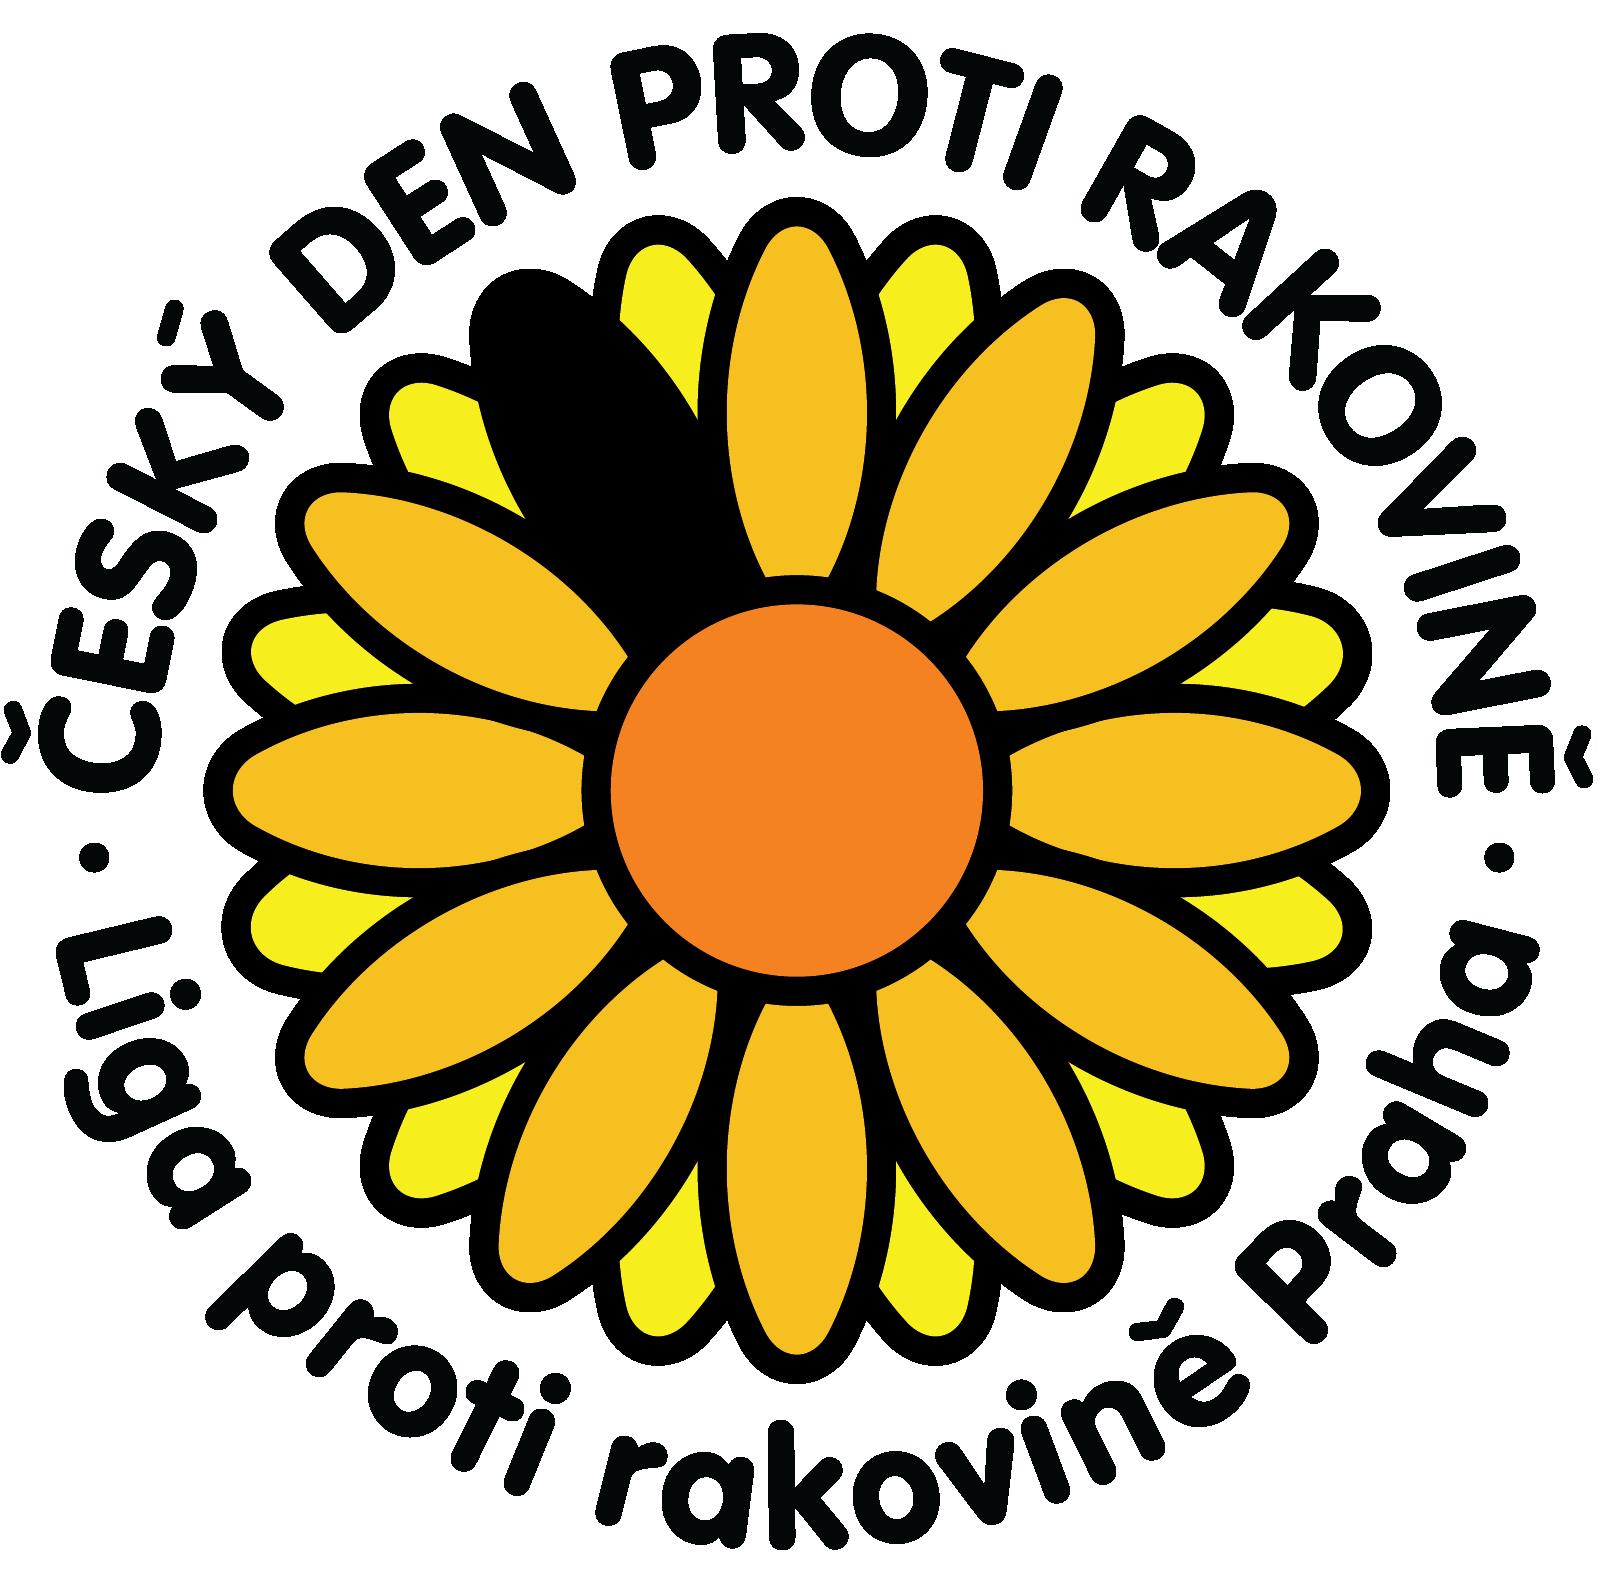 https://www.cdpr.cz/wp-content/uploads/2016/03/logoset_logo-cdpr1.png